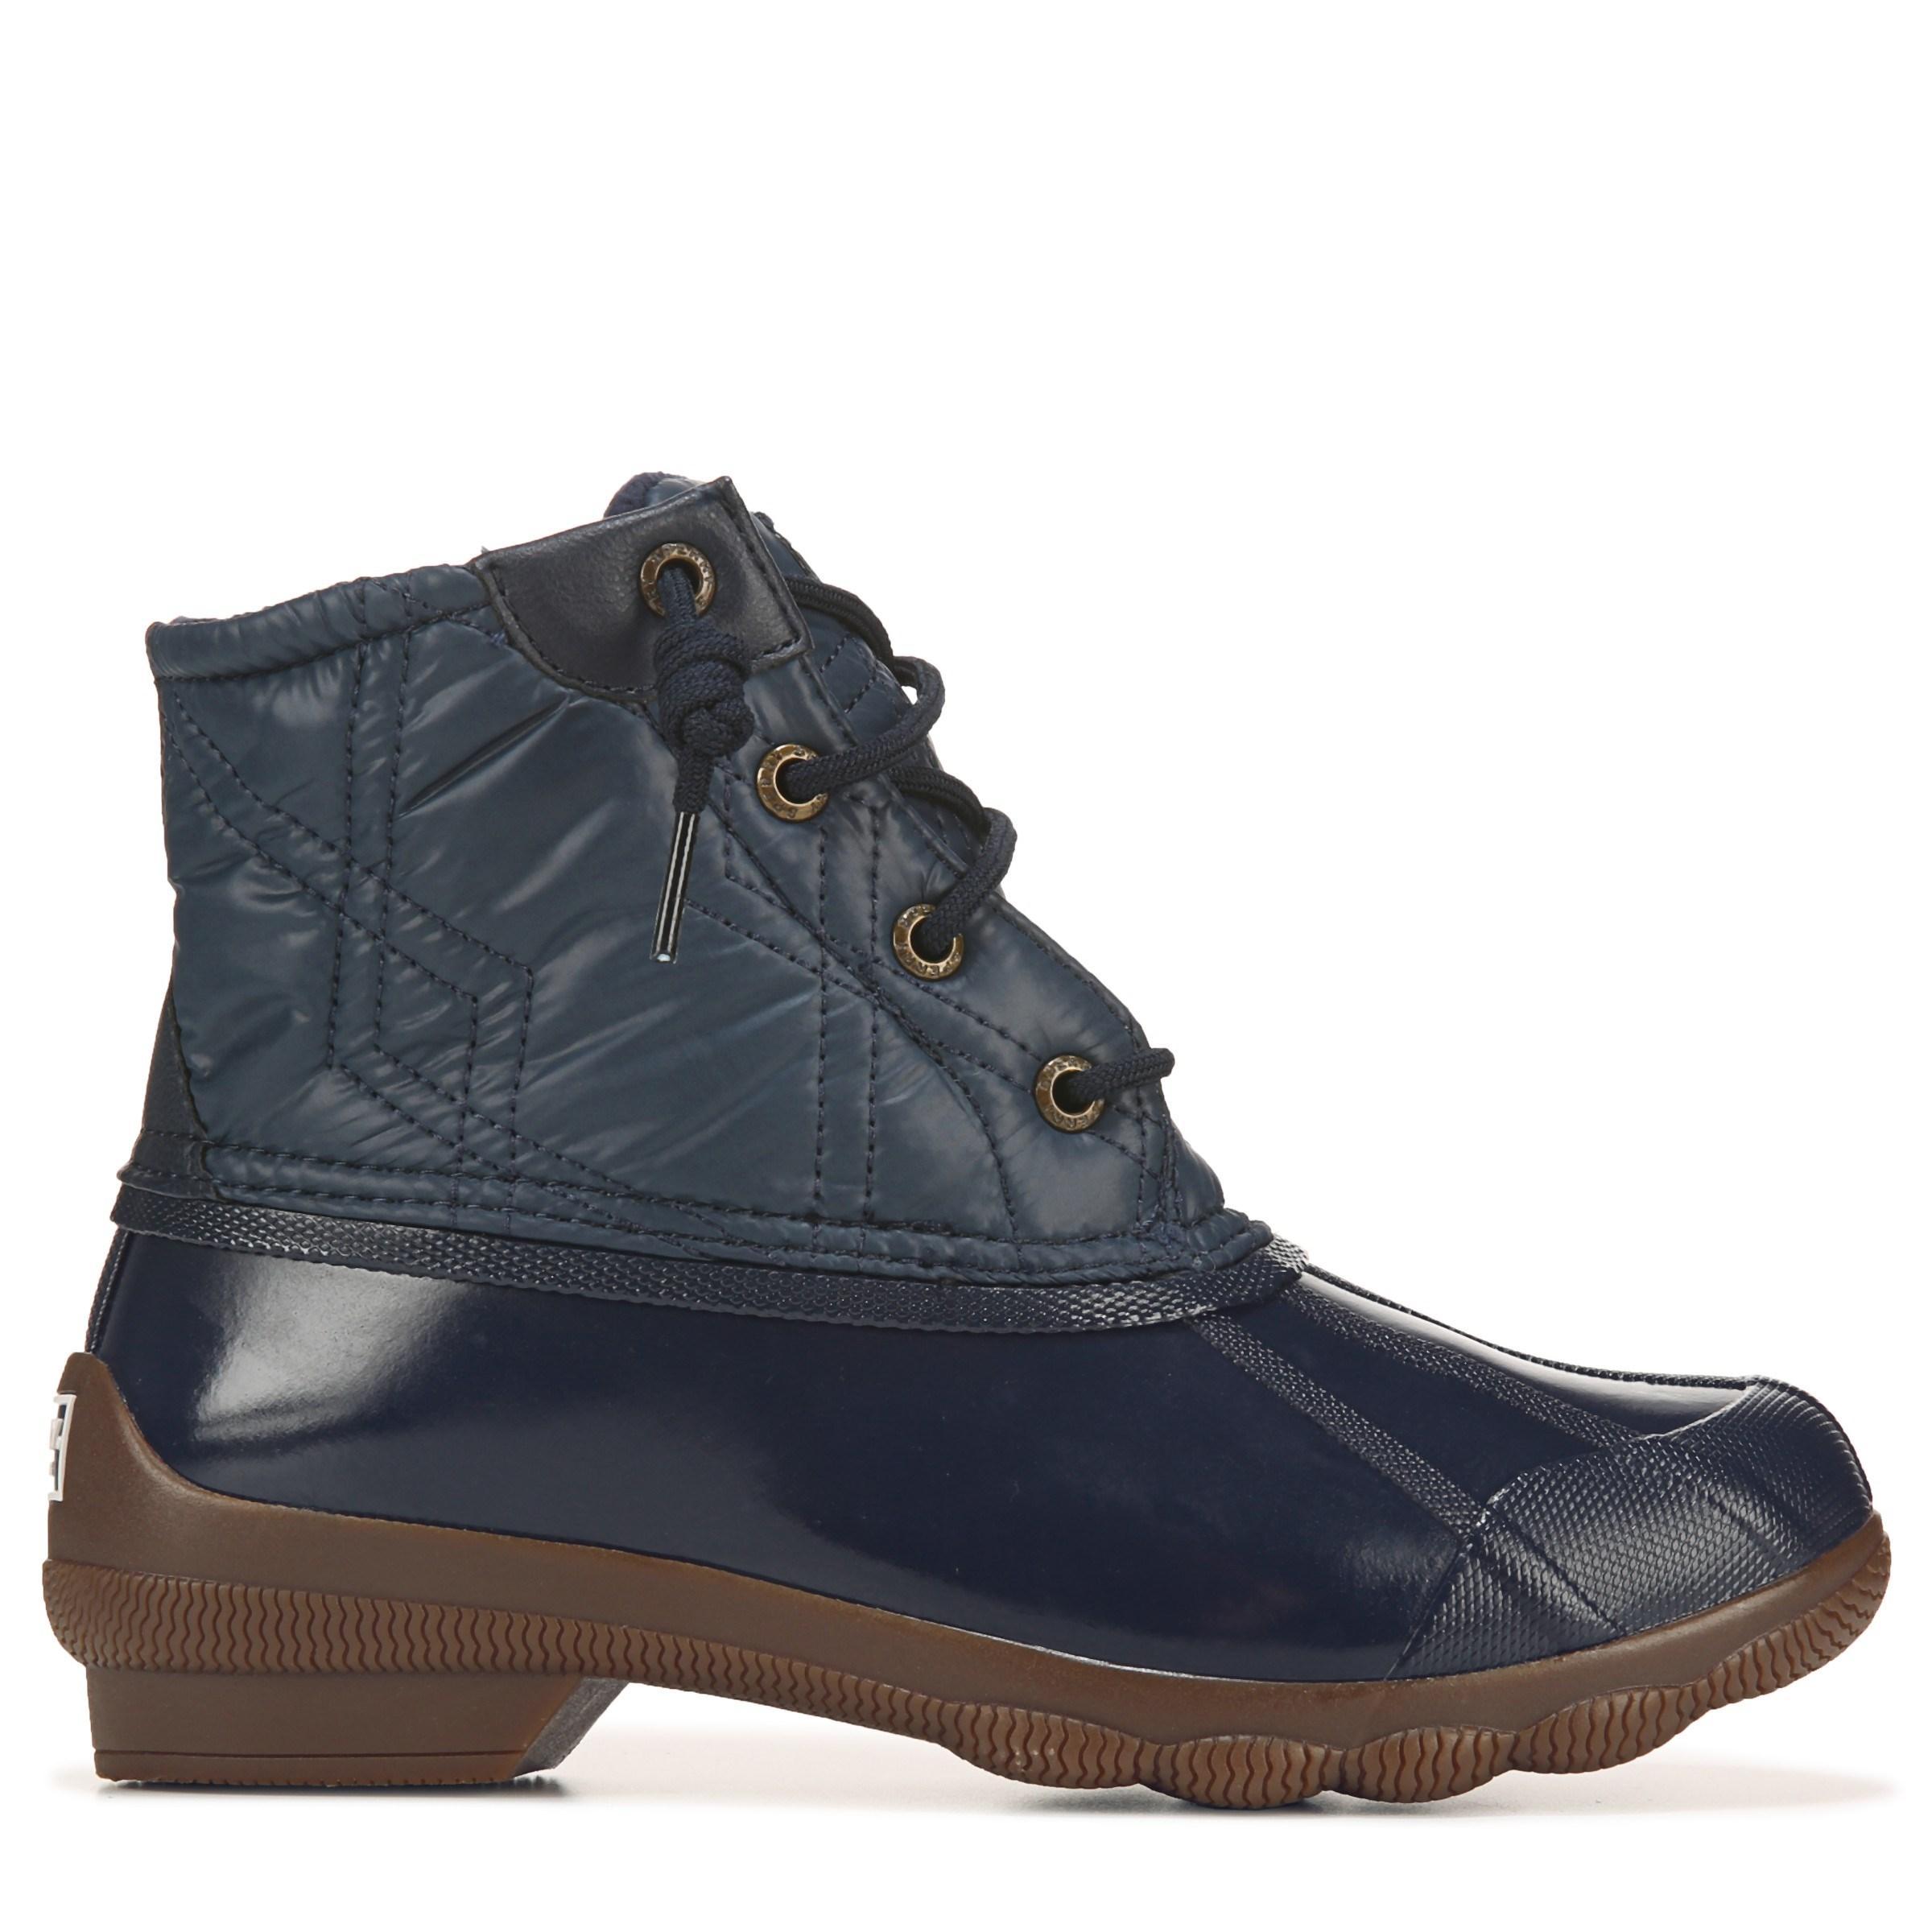 Sperry Top-Sider Syren Waterproof Duck Boots In Navy Blue -3845